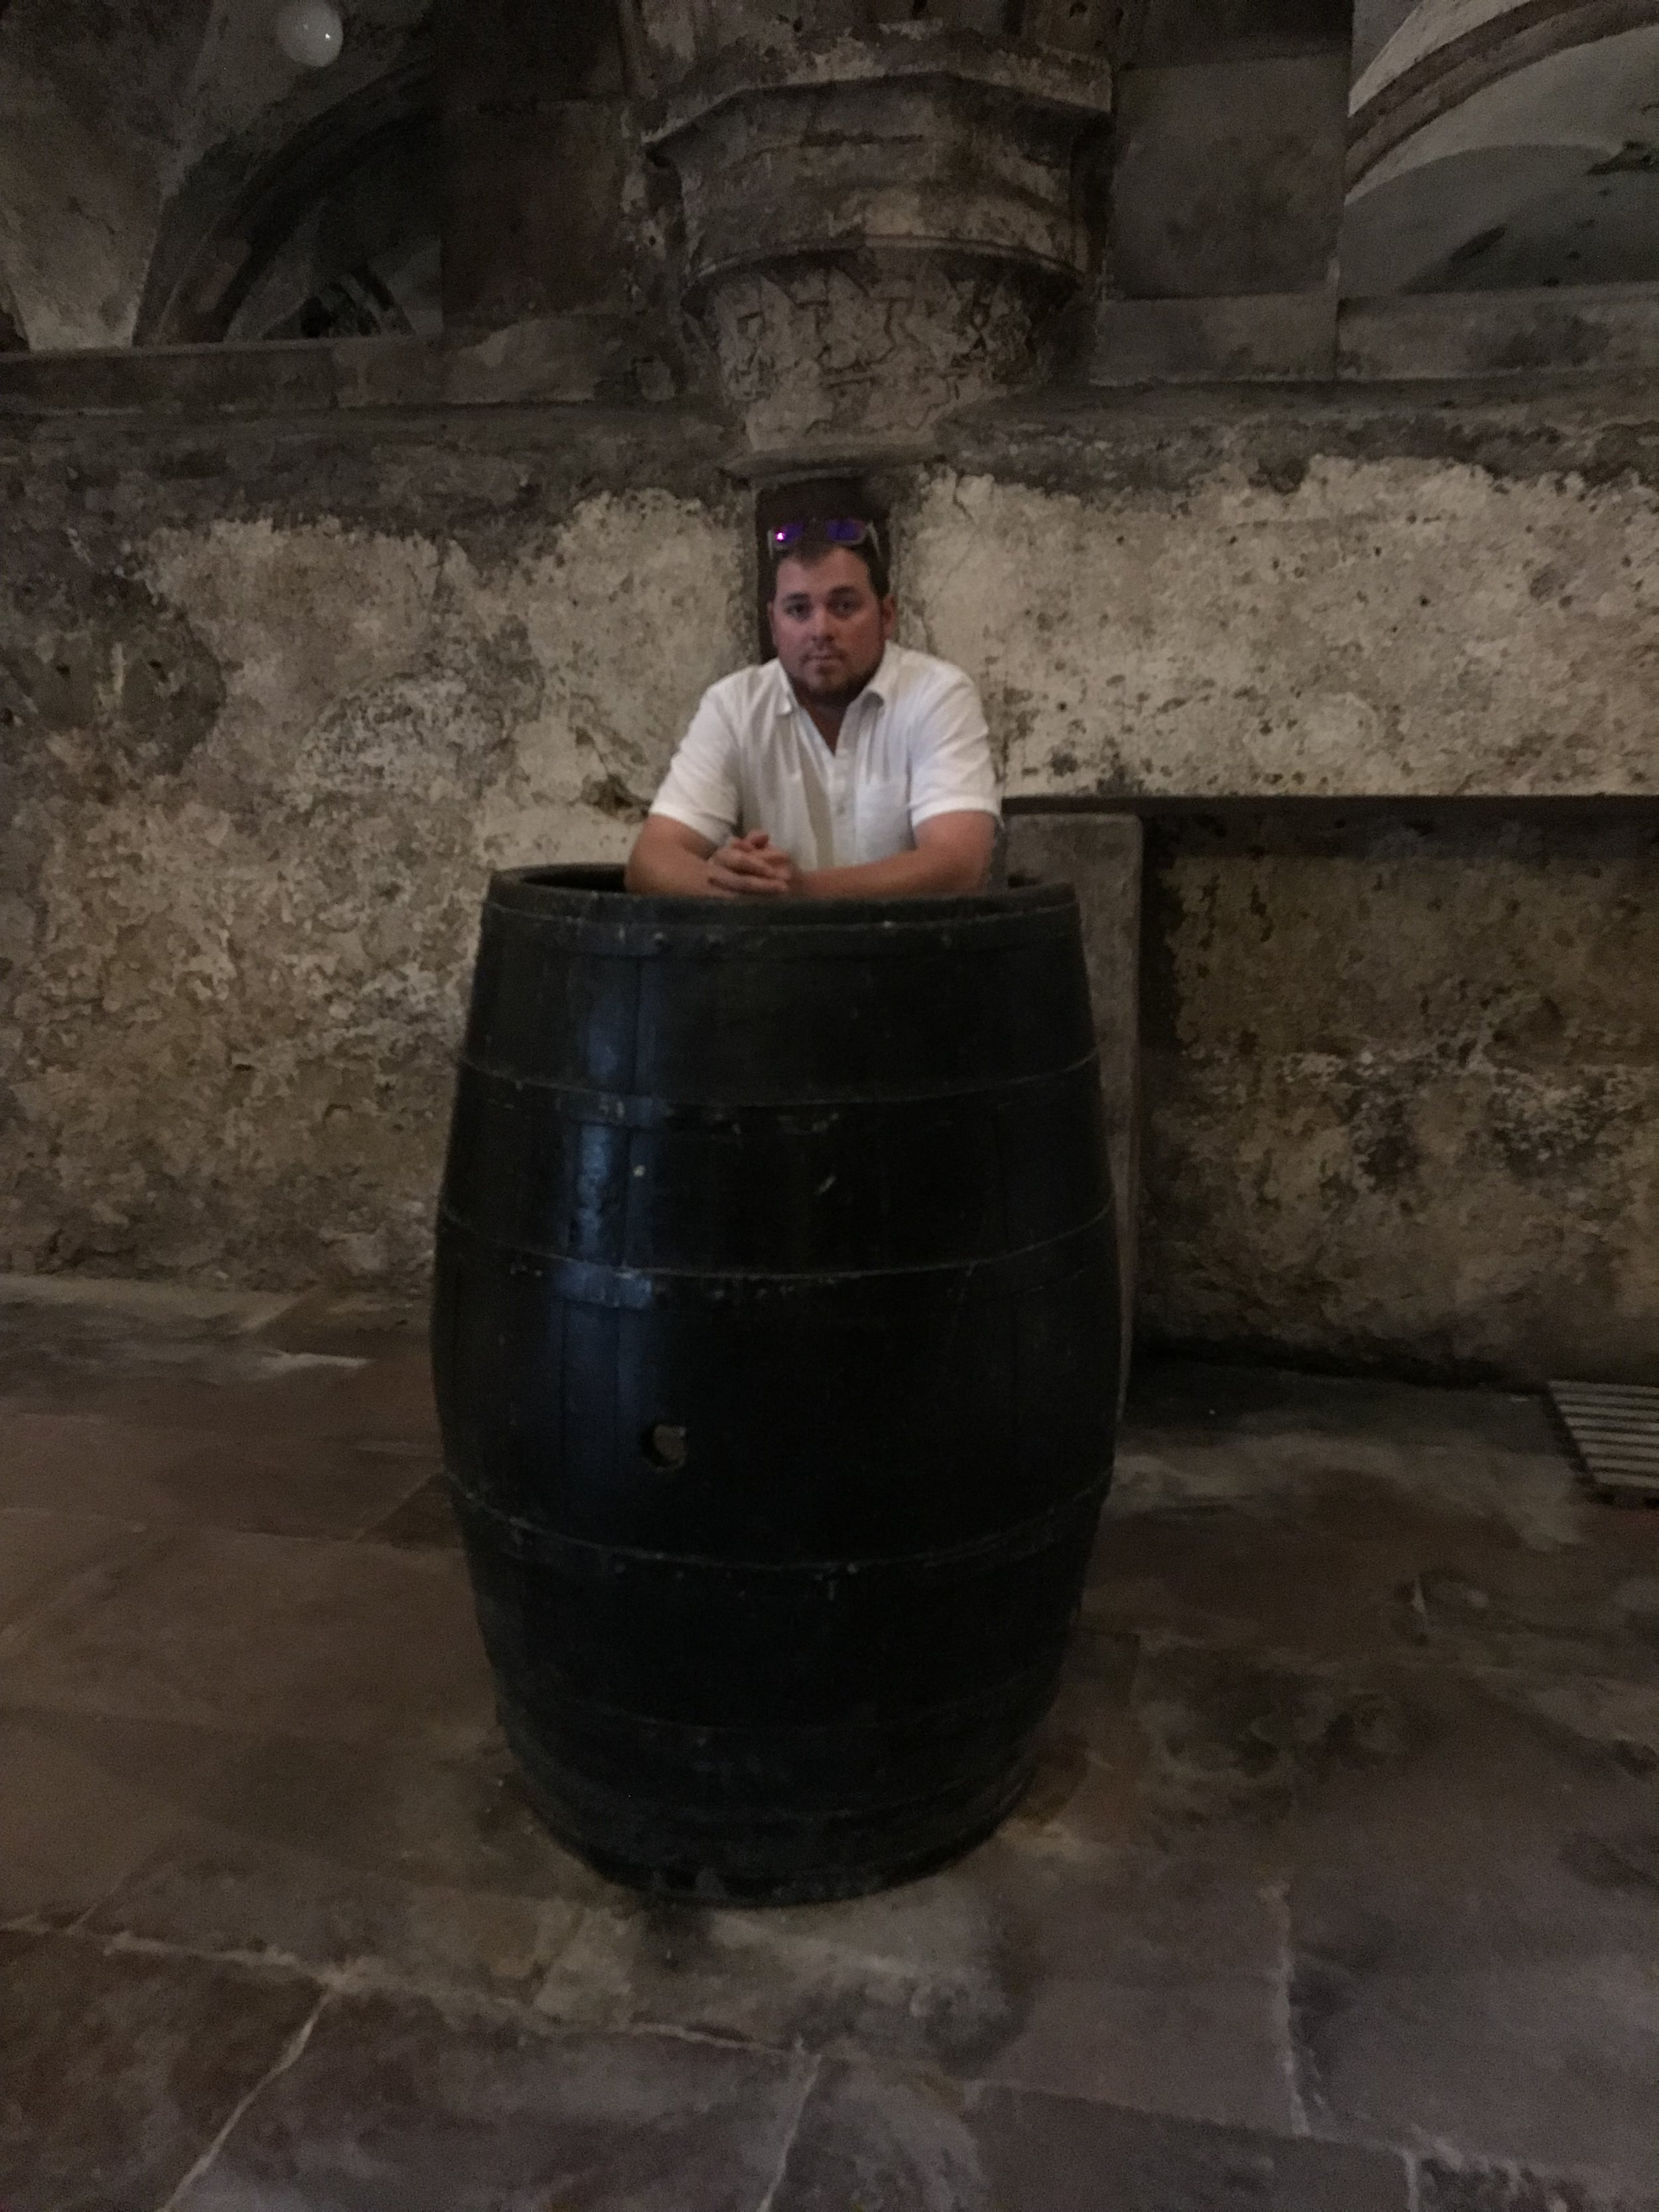 Kloster Eberbach barrel.jpg